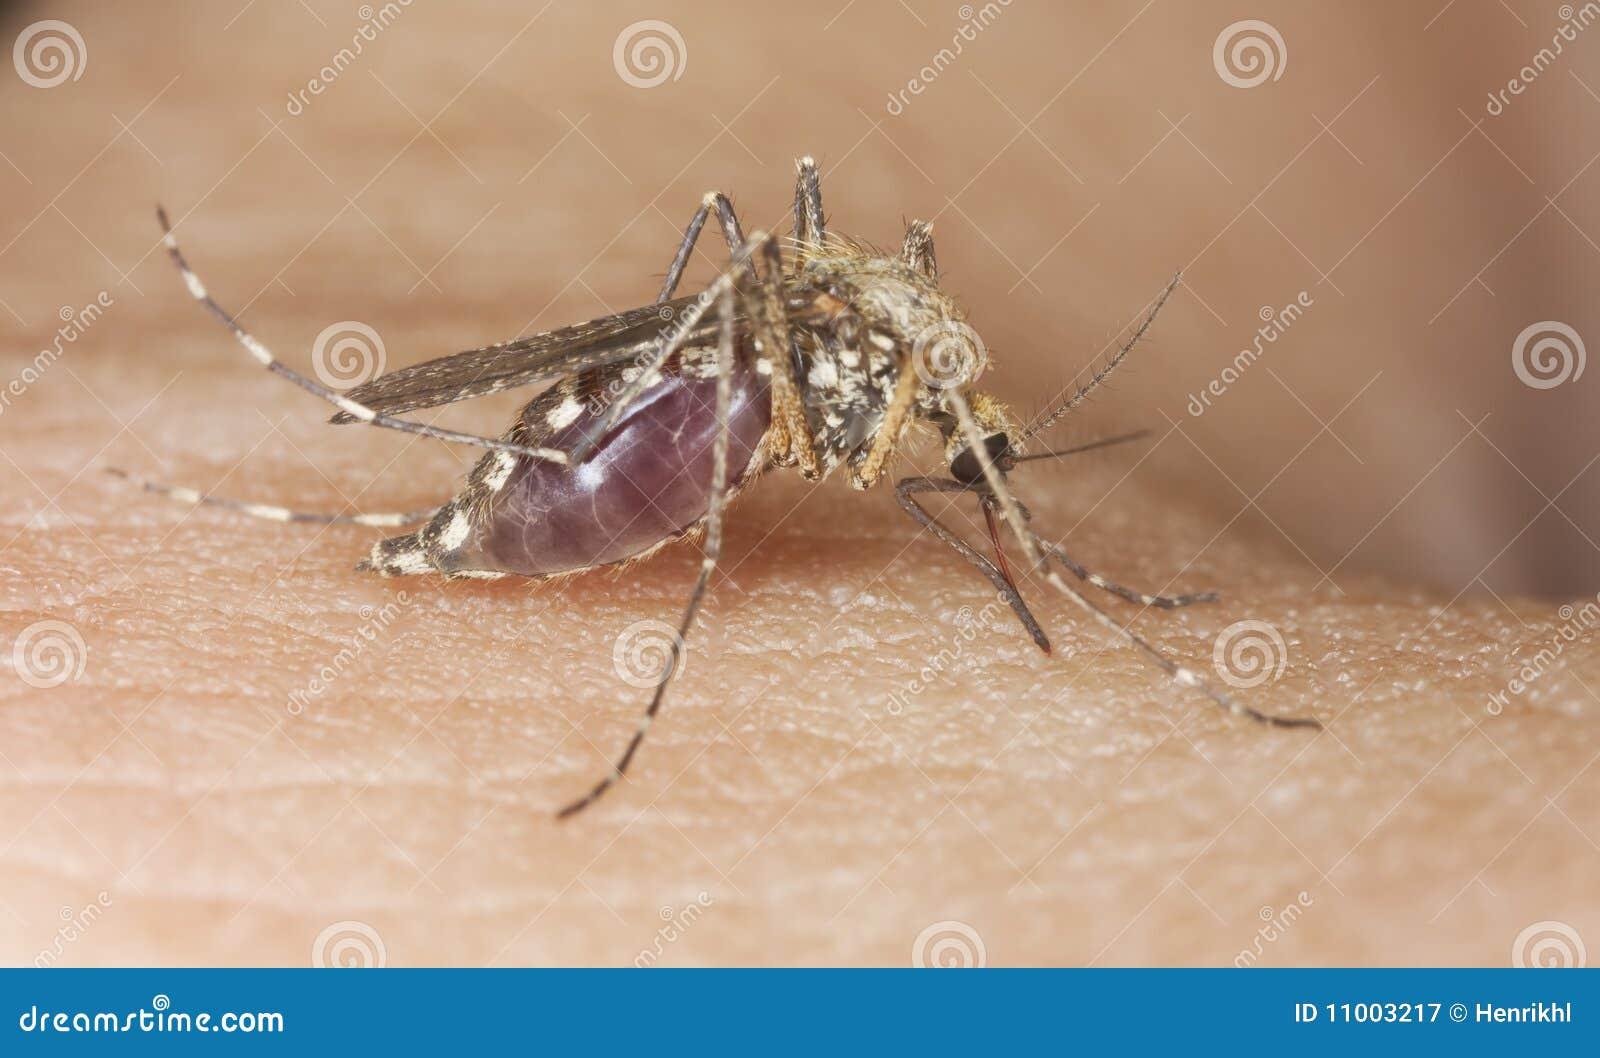 Primer extremo de la sangre que aspira del mosquito.